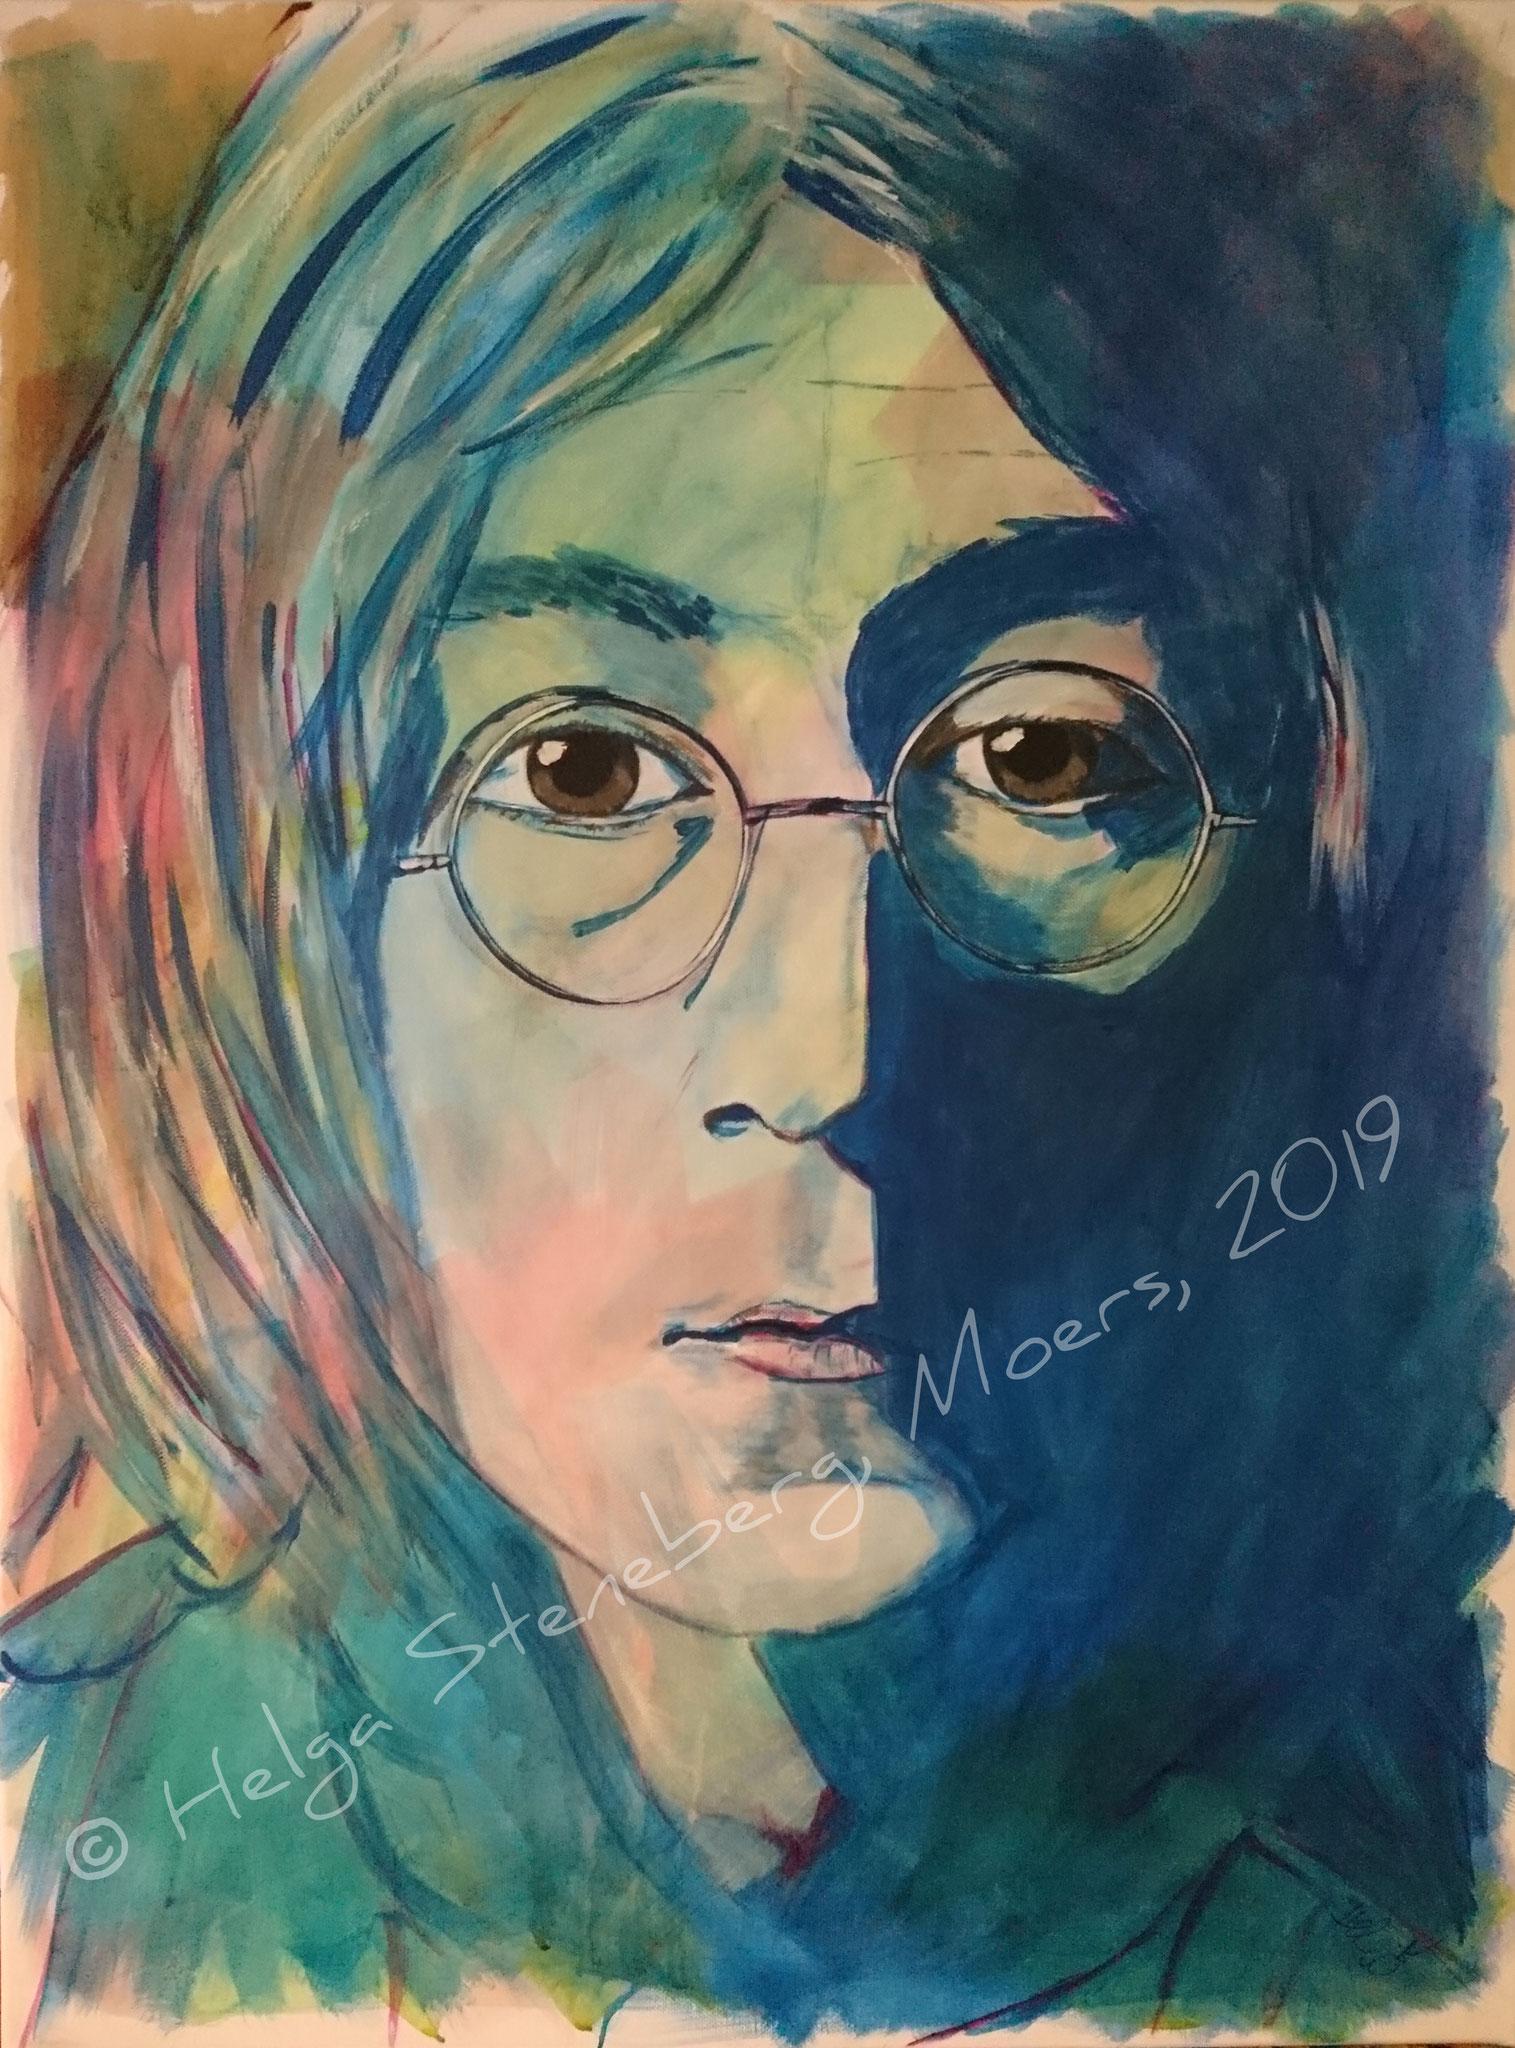 John Lennon, 80x60, LW